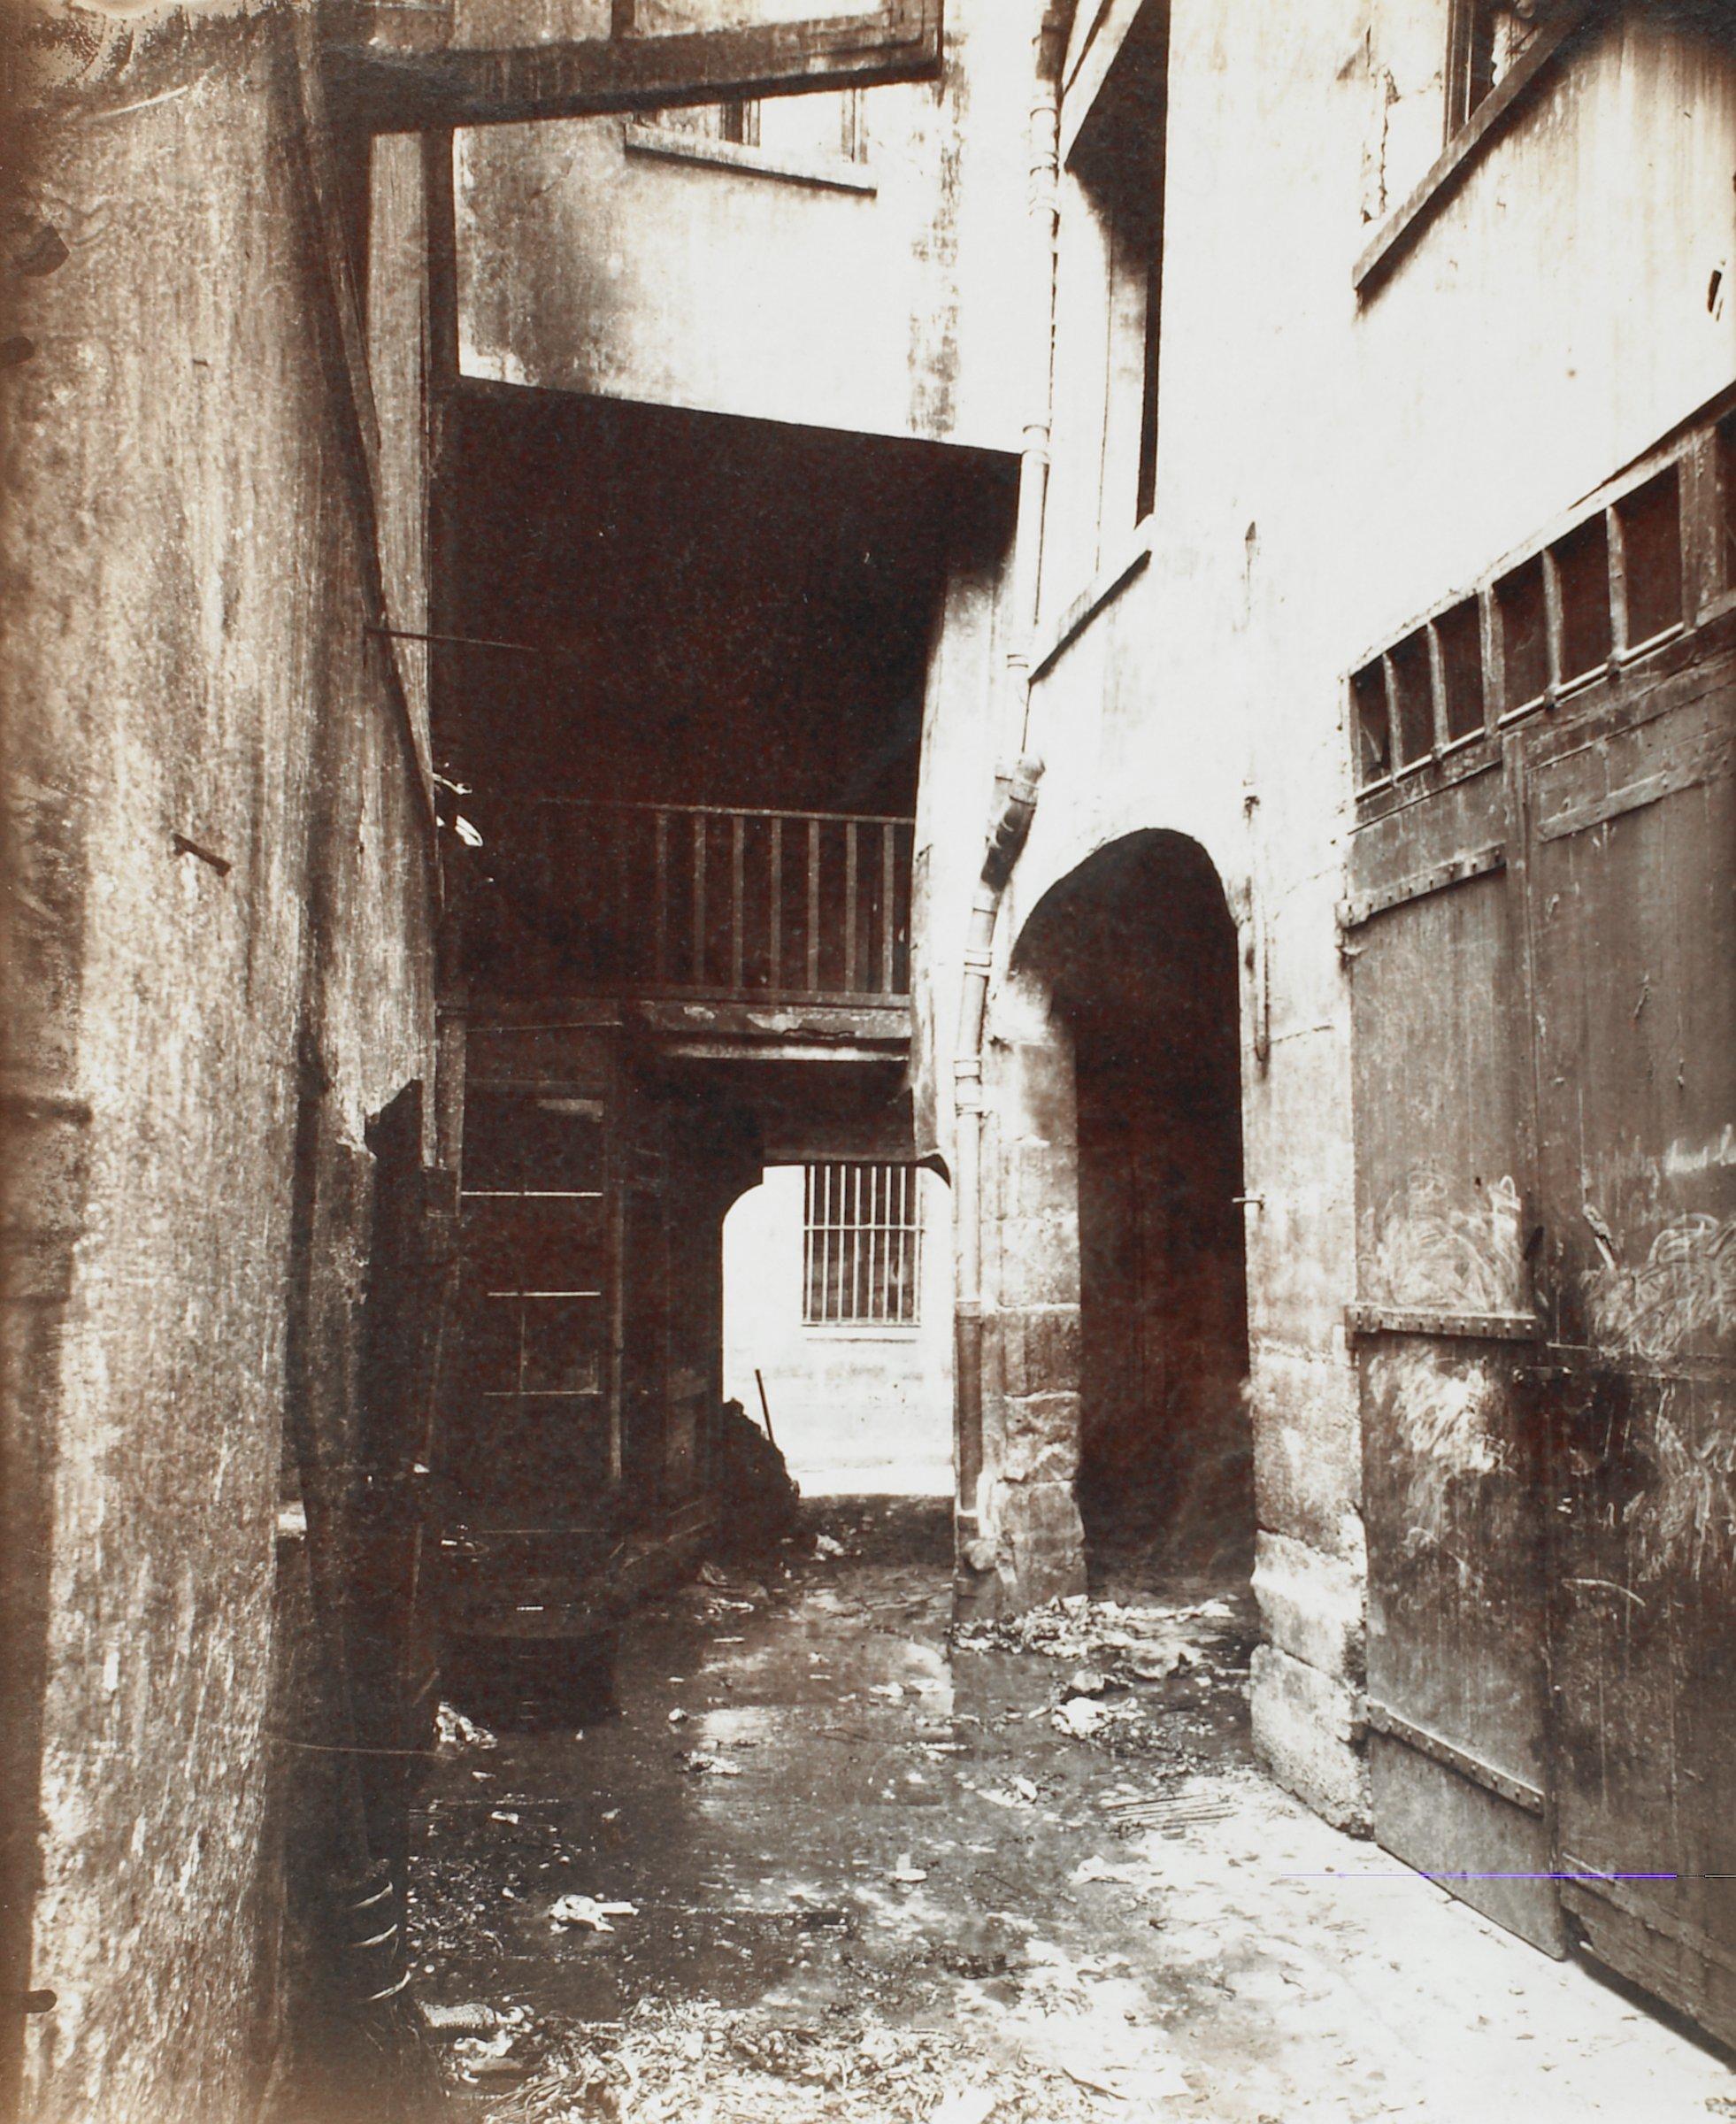 Cour, 12 rue Pierre-au-Lard, Eugène Atget, gelatin silver print on printing-out paper